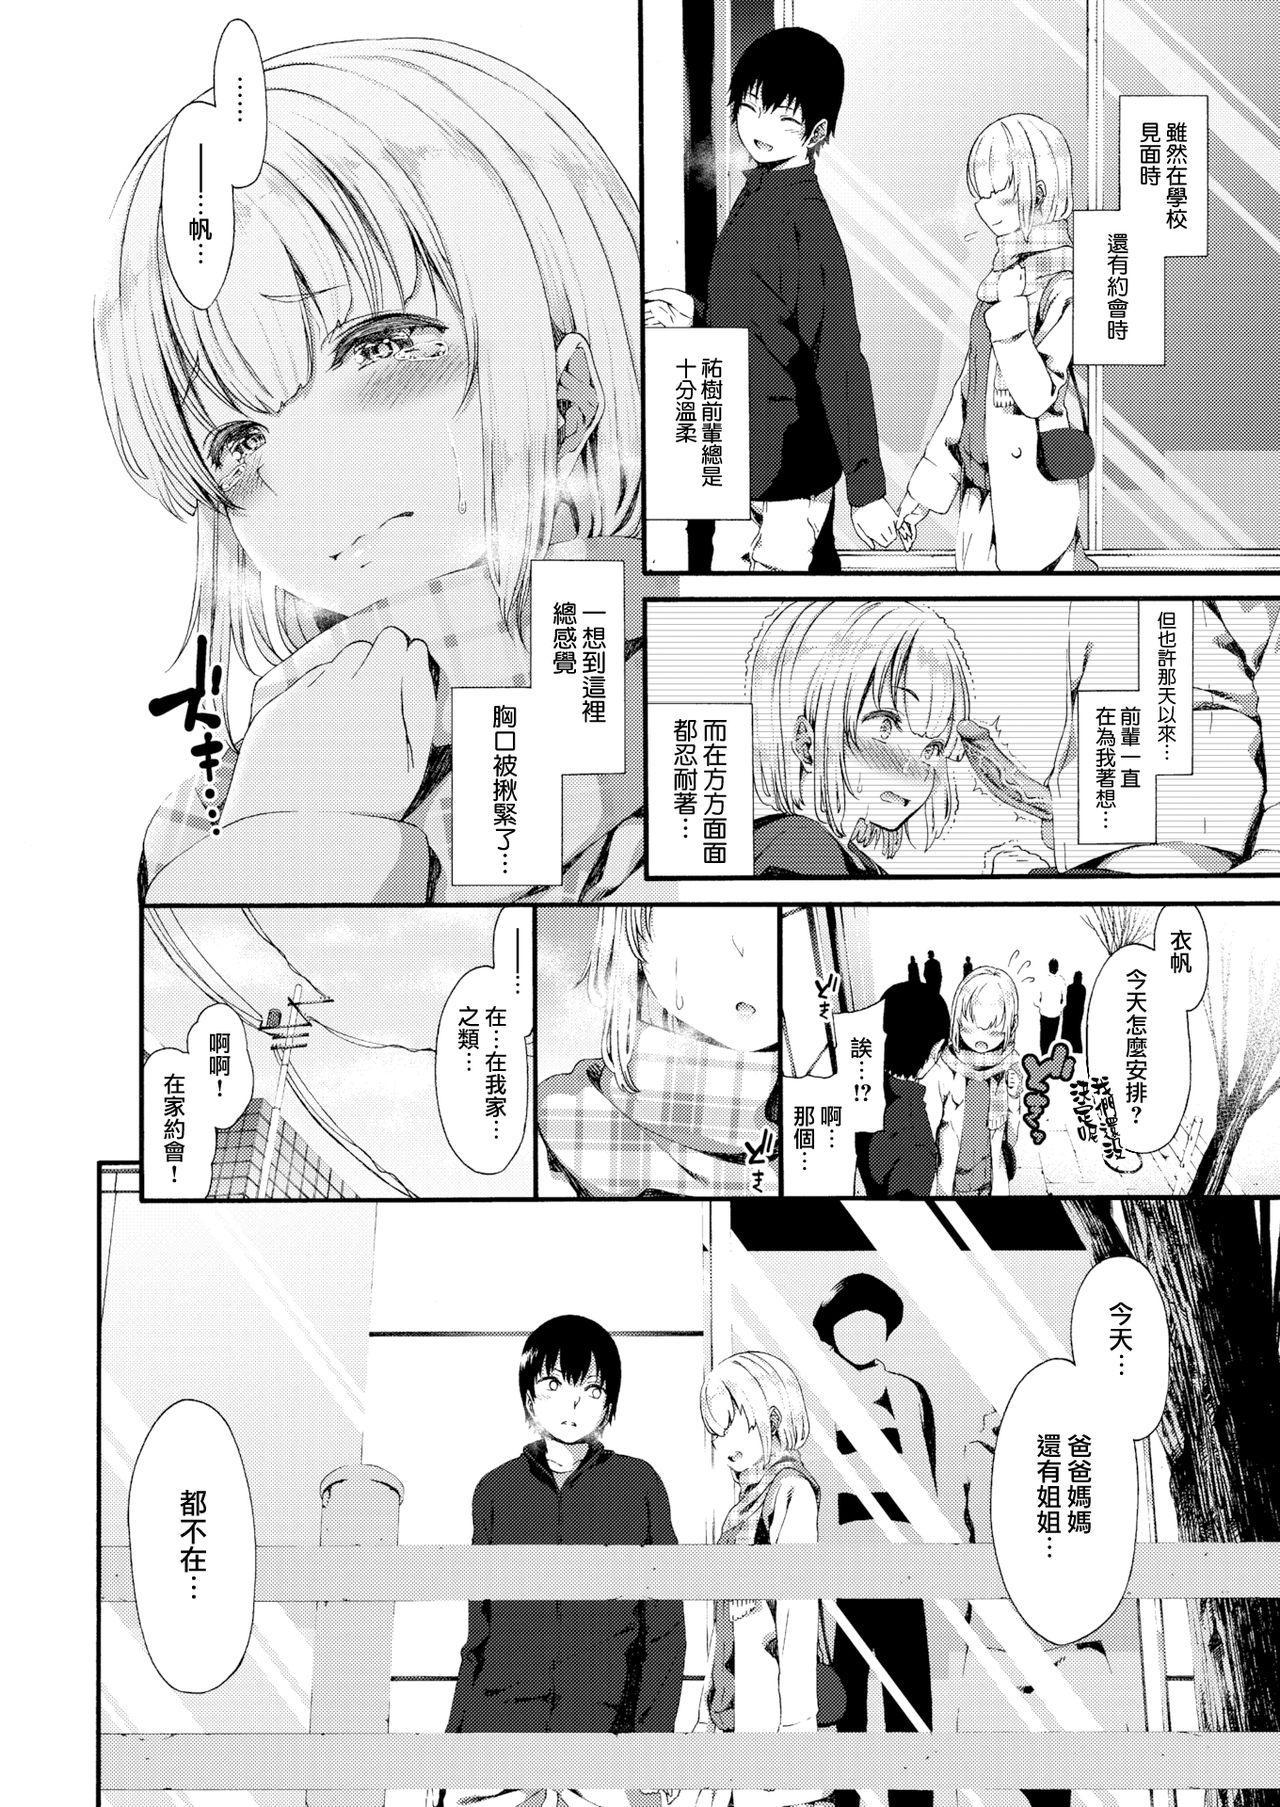 [Izure] Iho-chan no Jijou - Ihochan no situation. (COMIC X-EROS #63) [Chinese] [無邪気漢化組] [Digital] 3